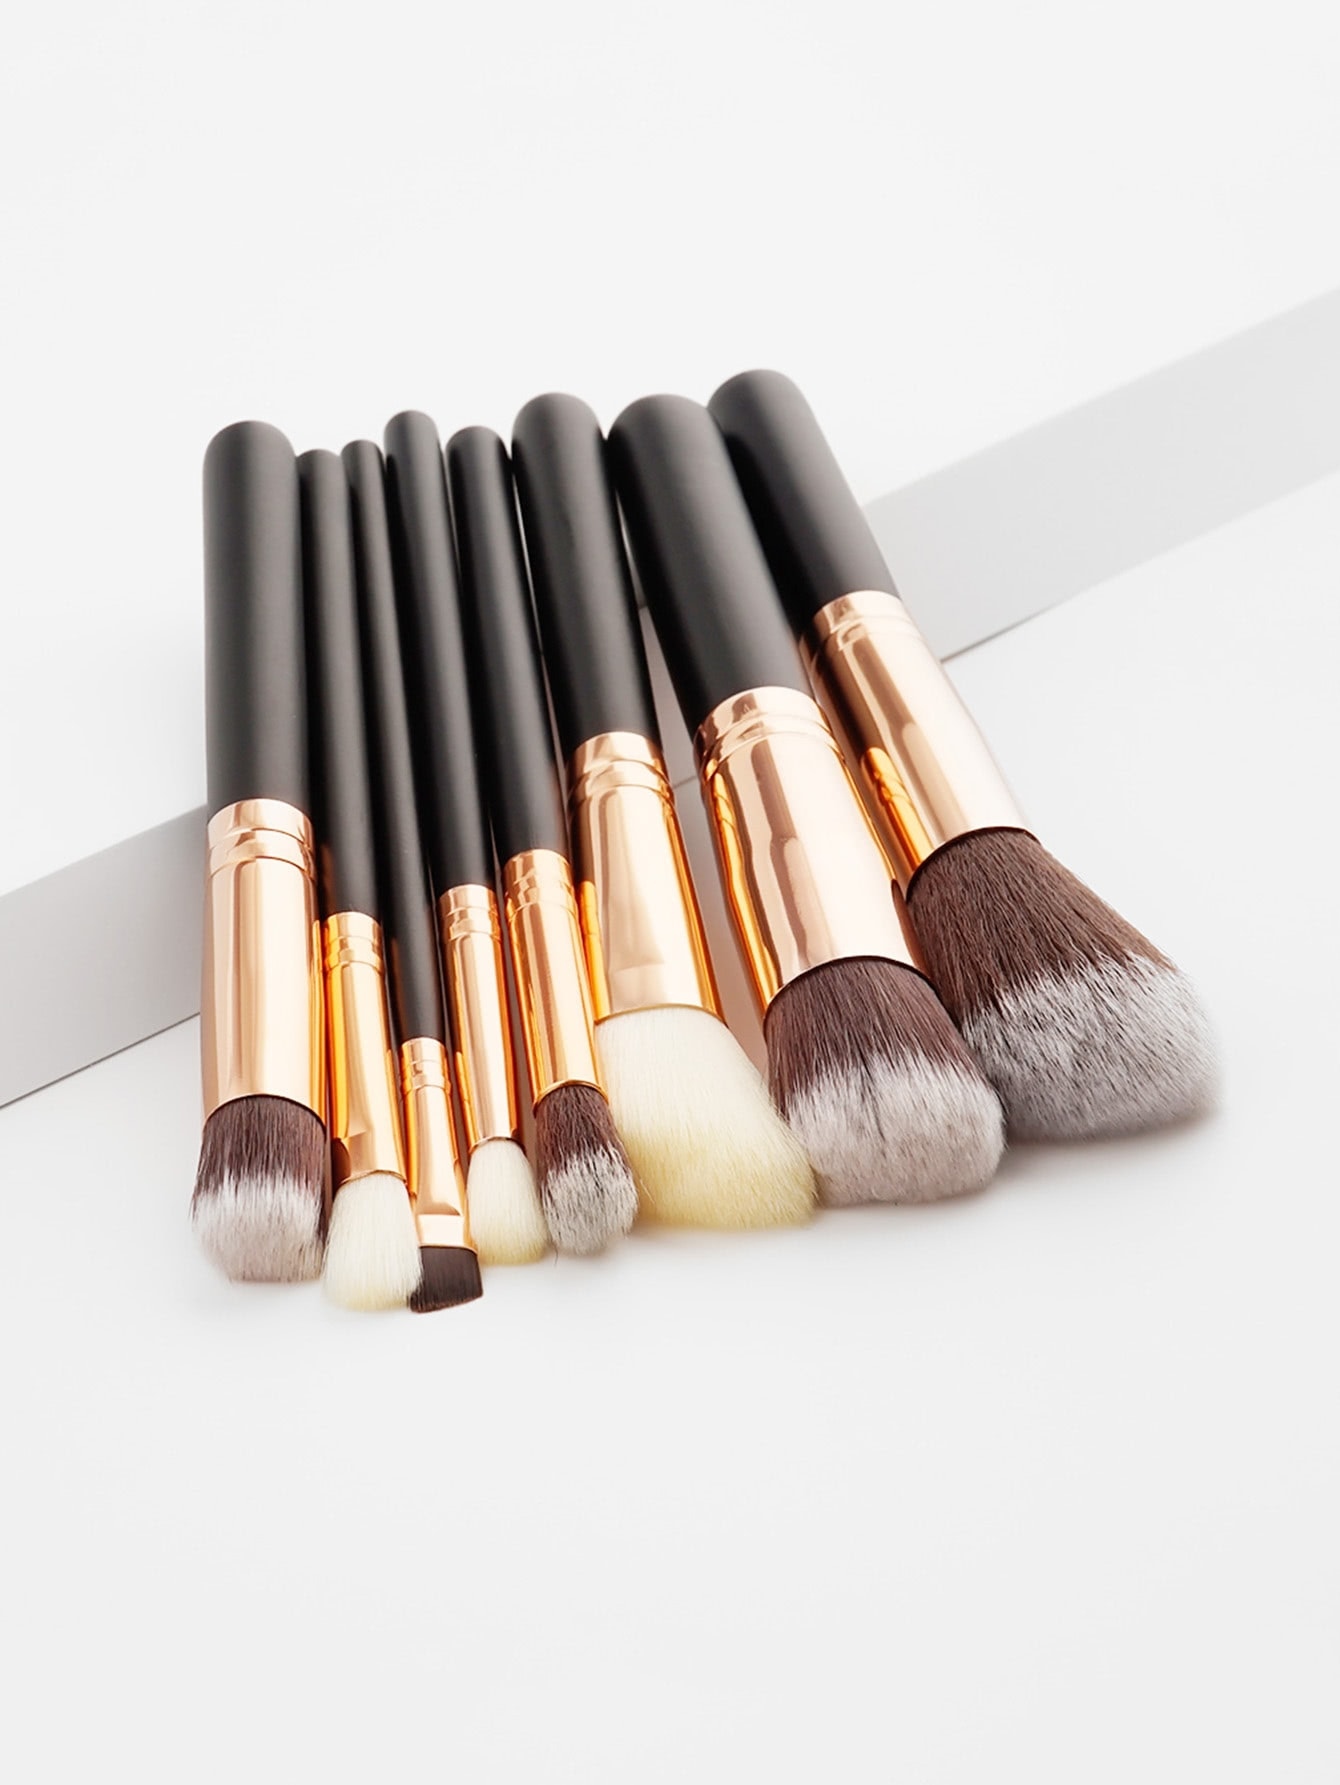 Soft Bristle Makeup Brush Set 8pcs